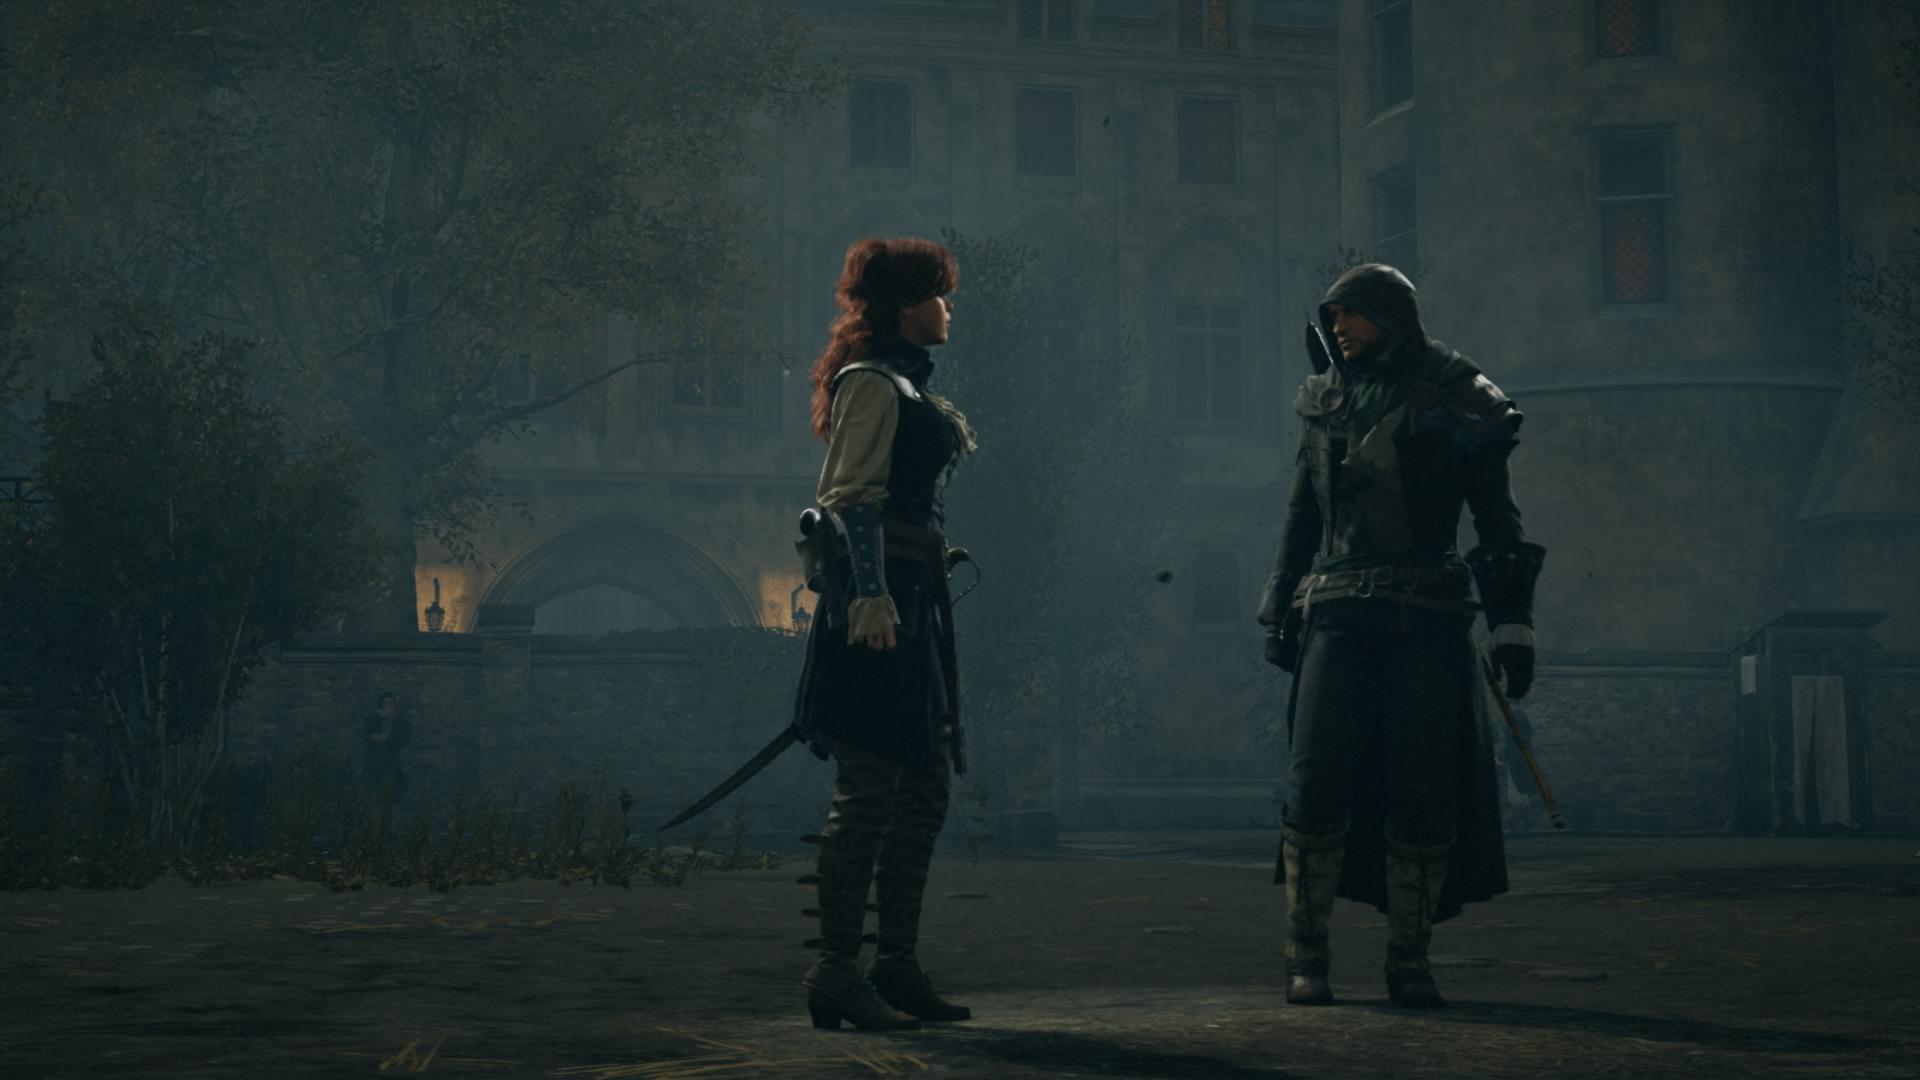 assassins creed unity arno and elise